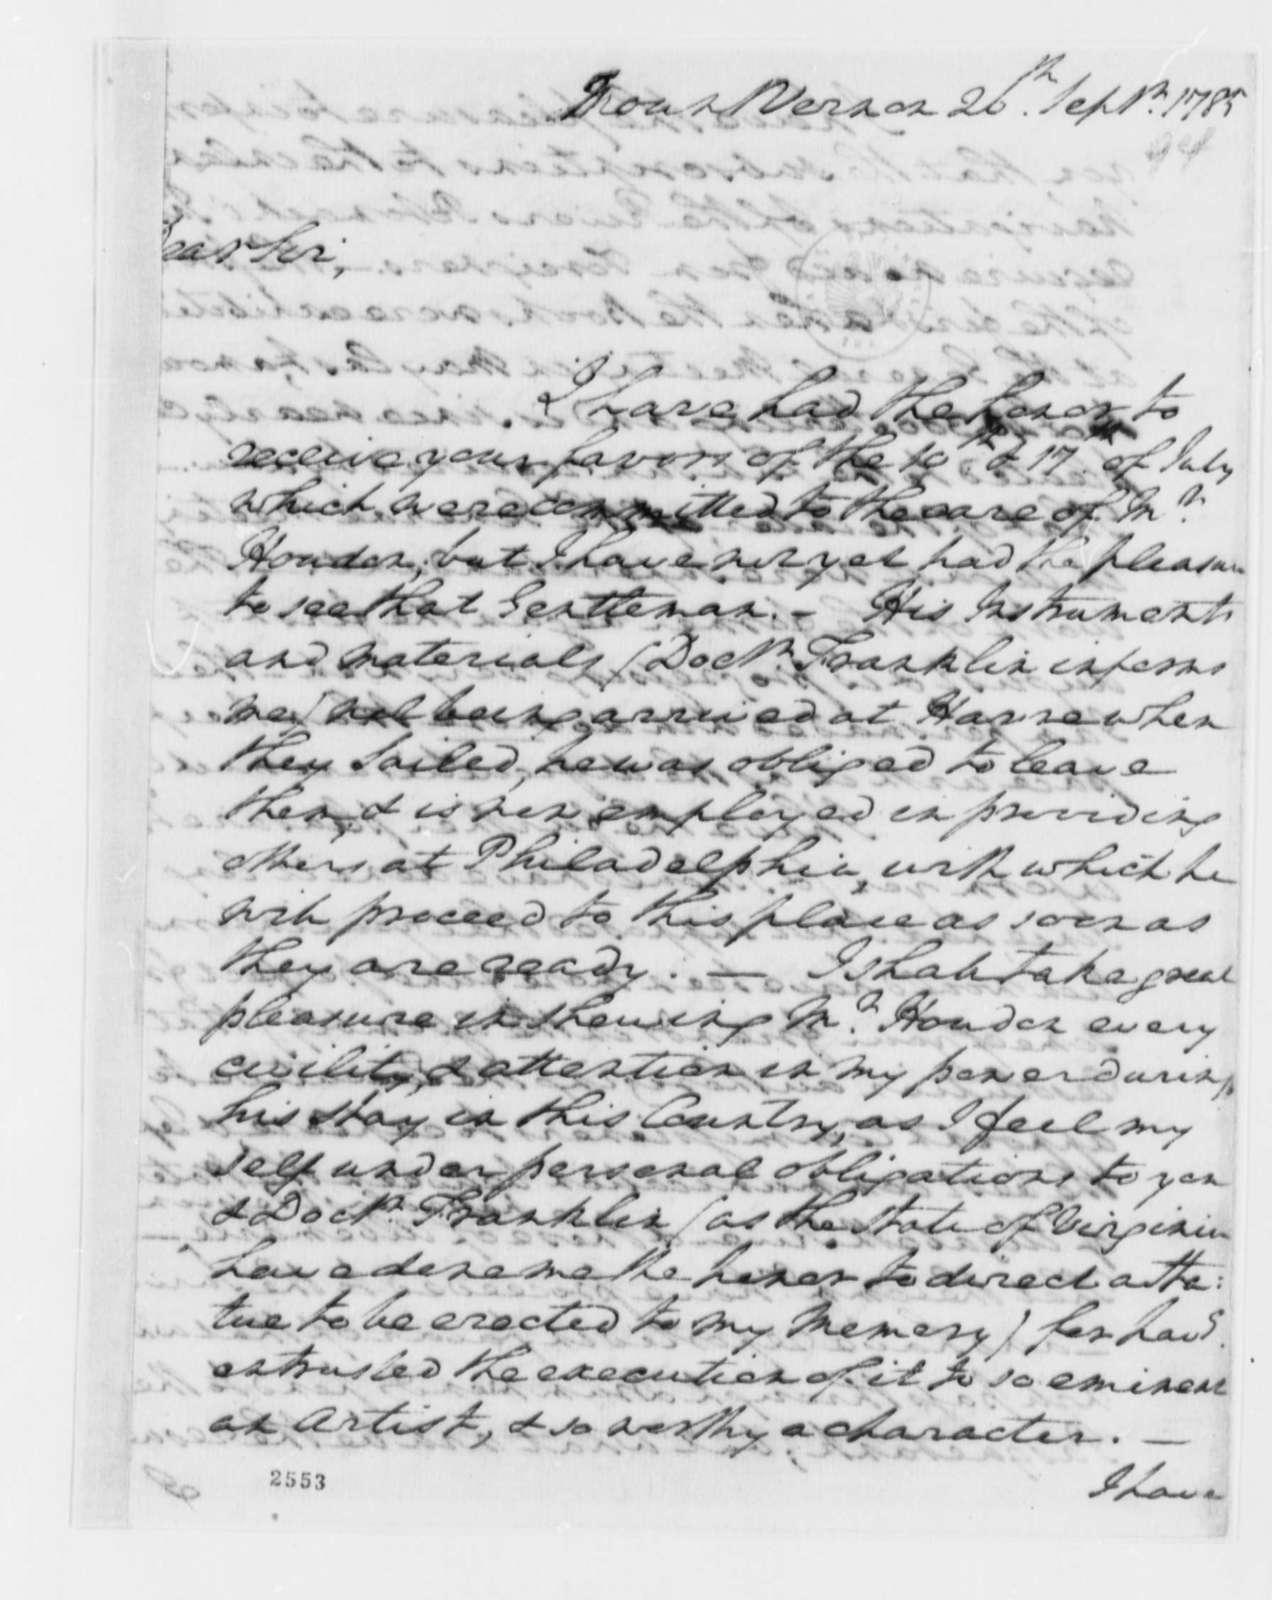 George Washington to Thomas Jefferson, September 26, 1785